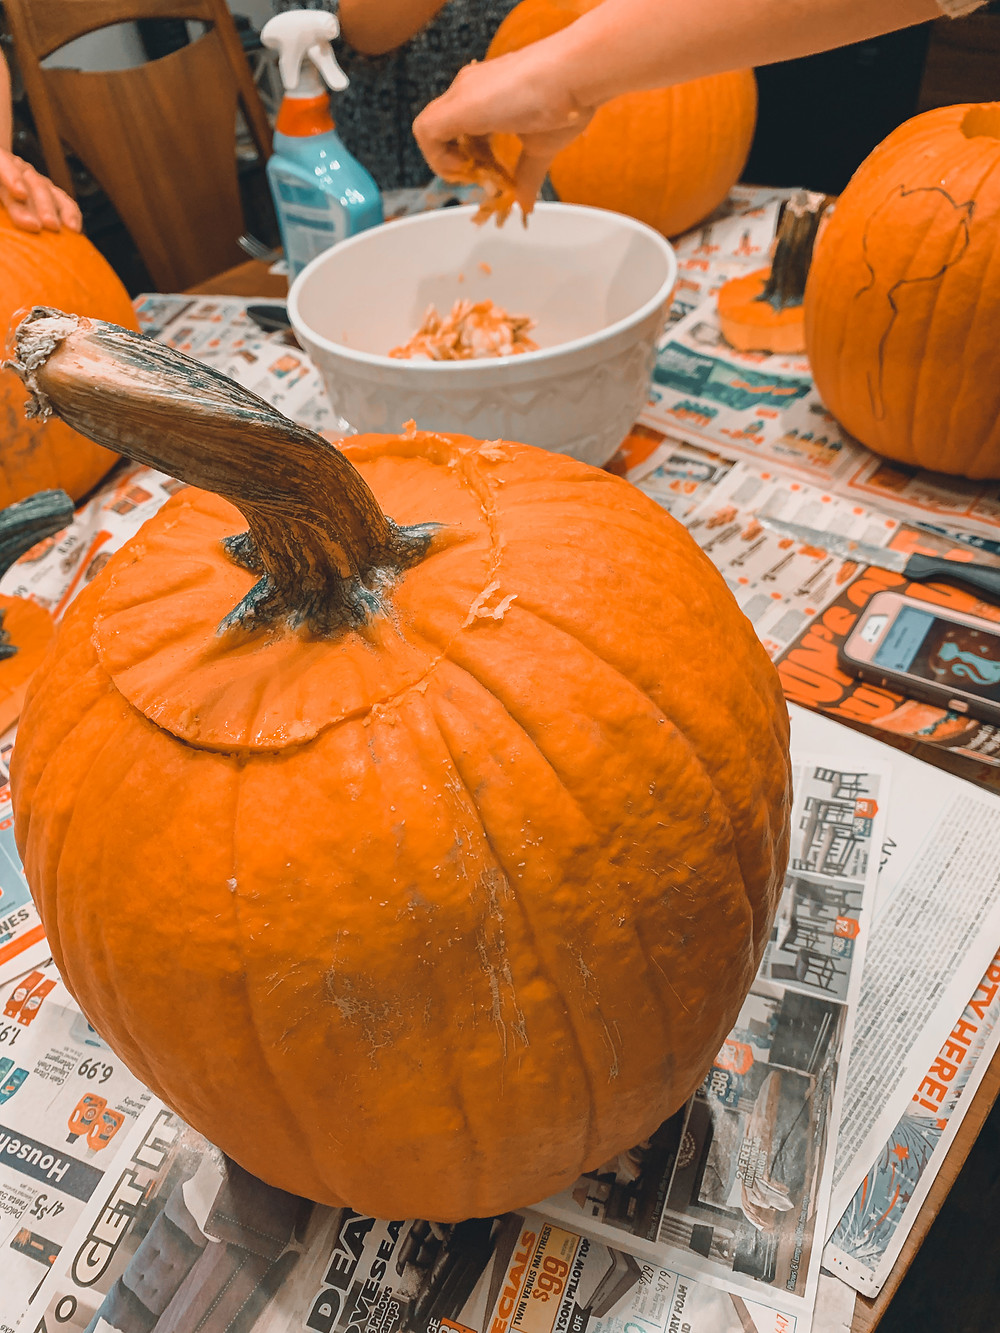 pumpkin carving newspaper orange pumpkin